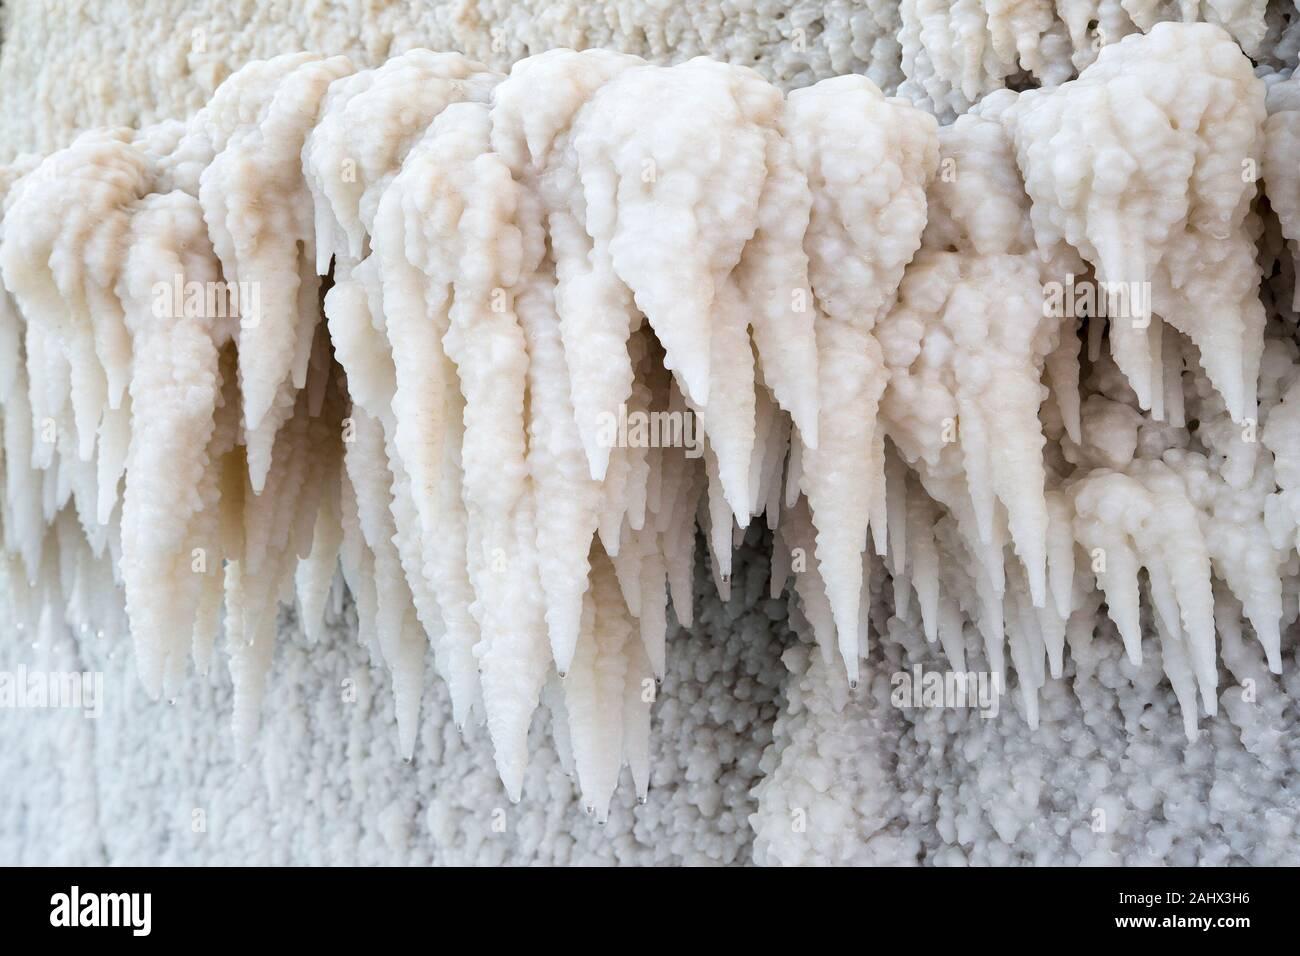 Salt stalactites forming on the Dead Sea coast.  The Sea has the lowest elevation on earth. Stock Photo